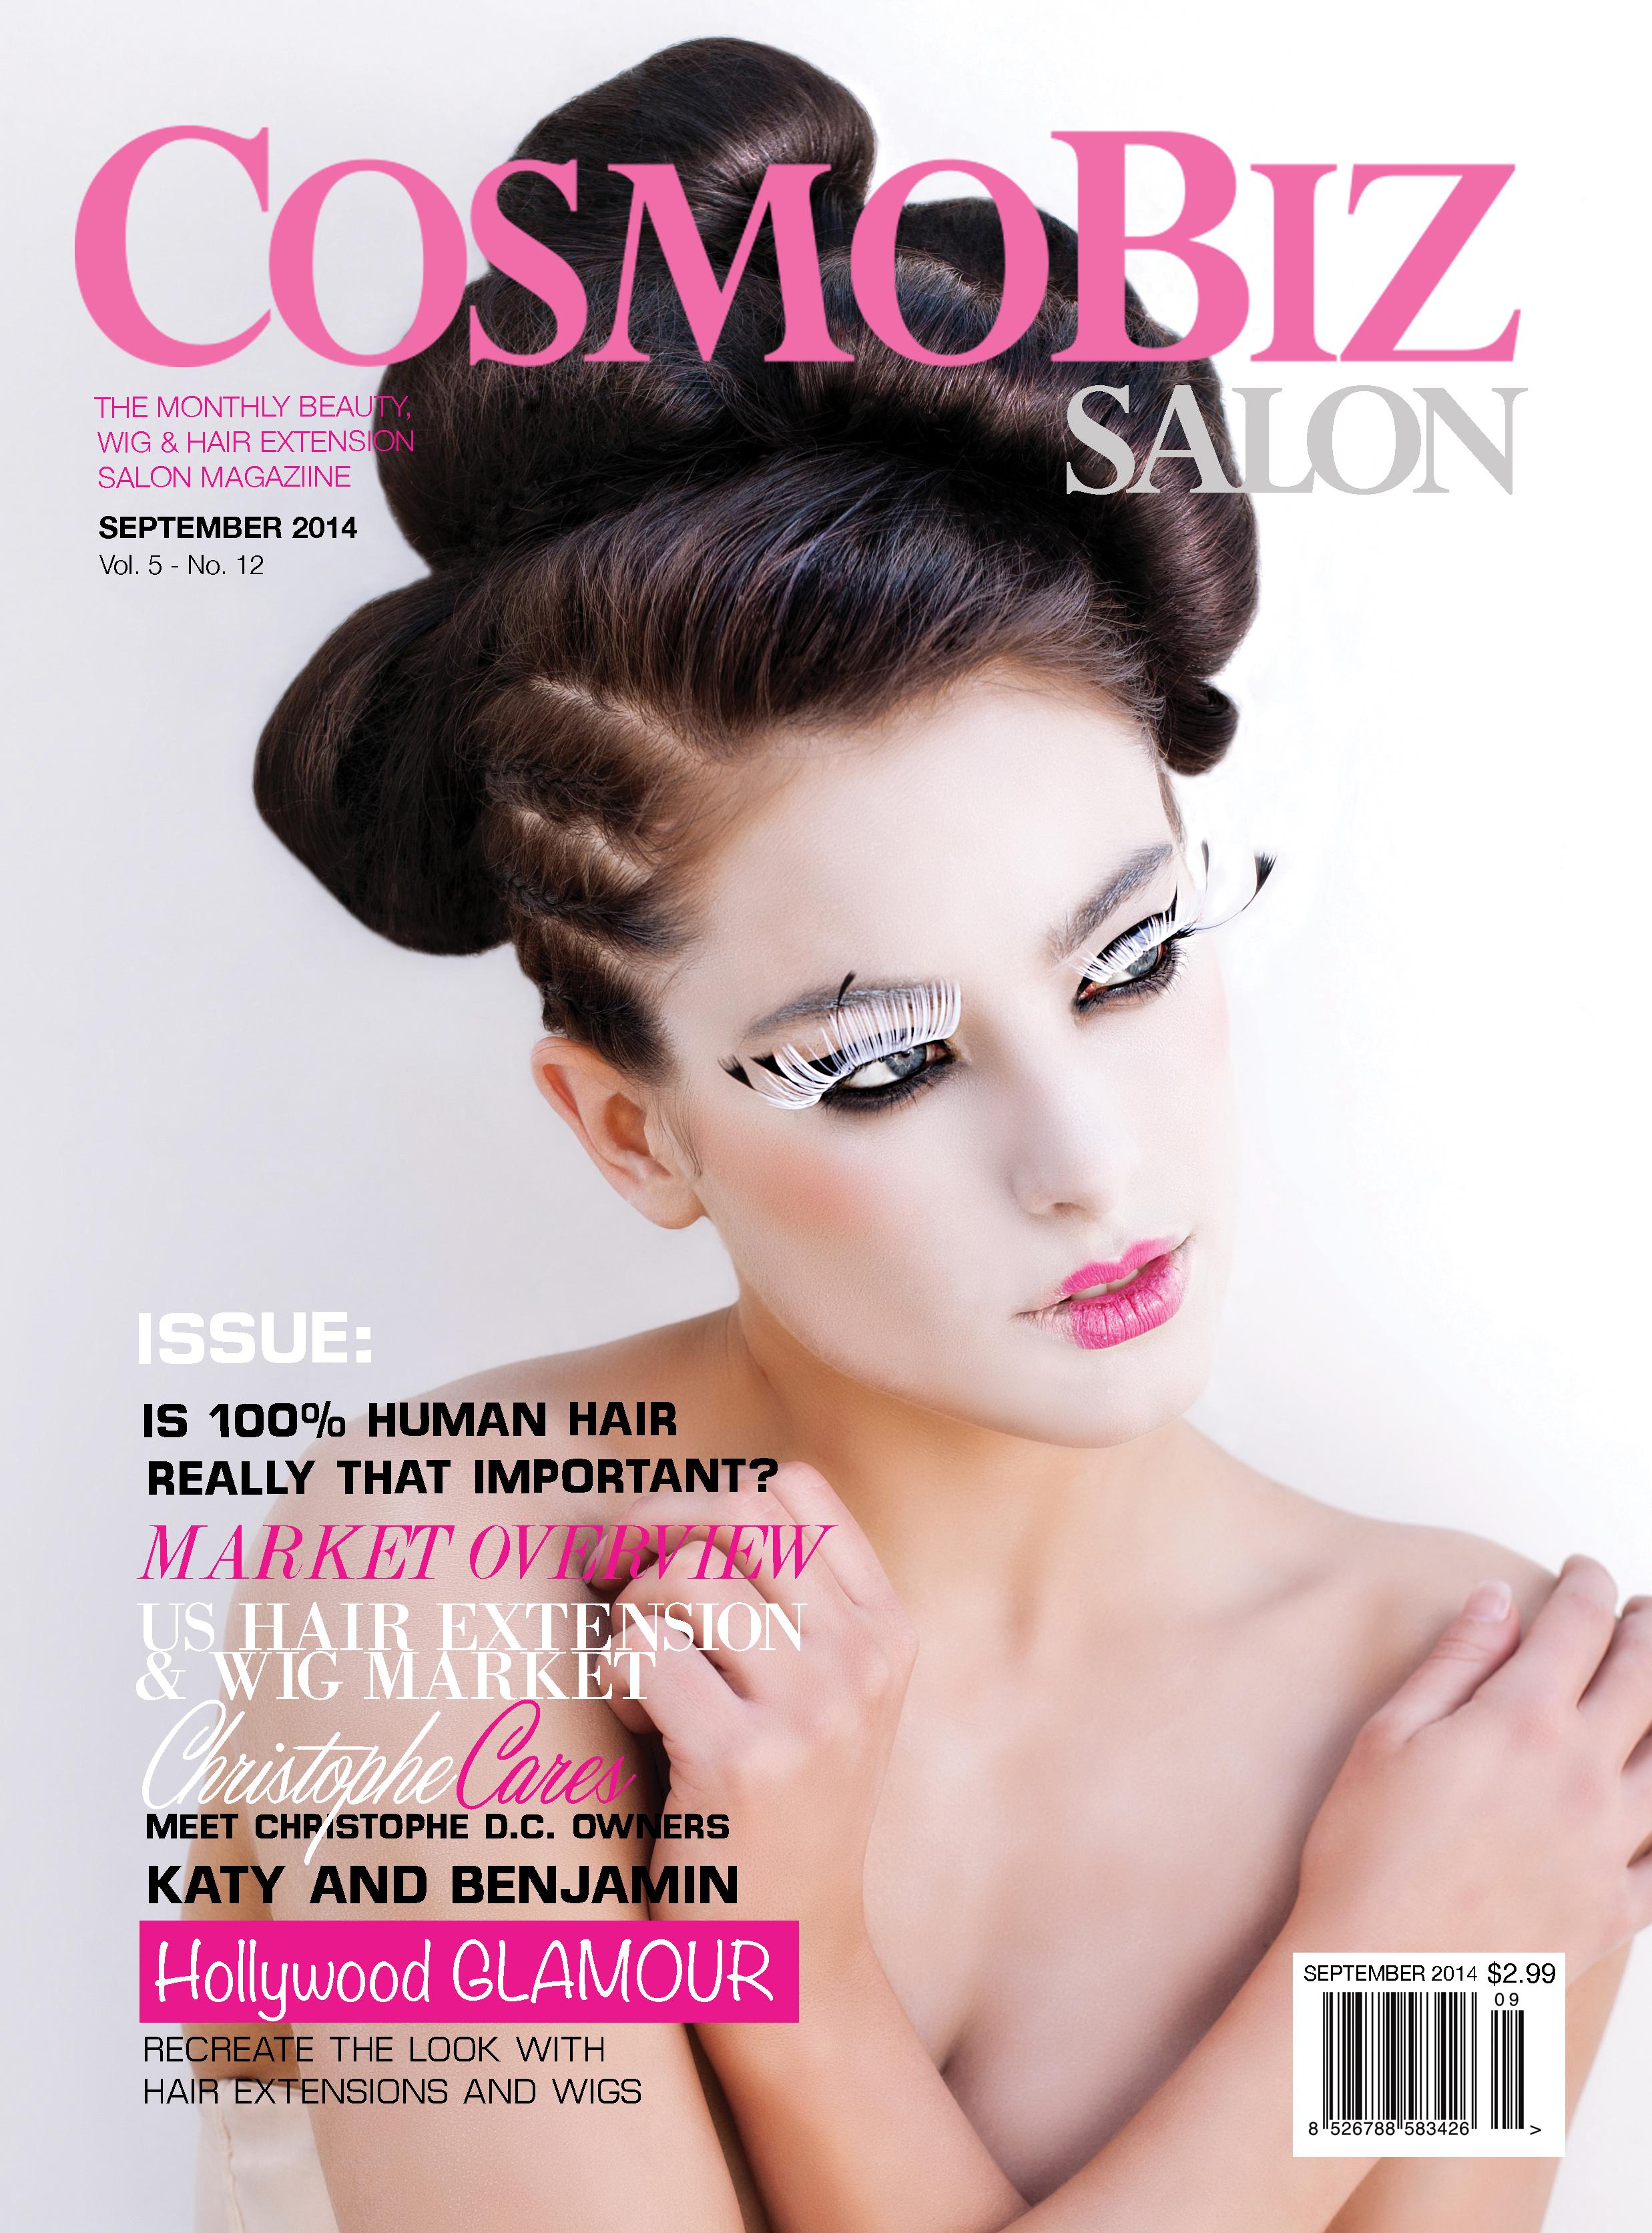 Cosmobiz Salon Magazine Specializing In Hair Extensions